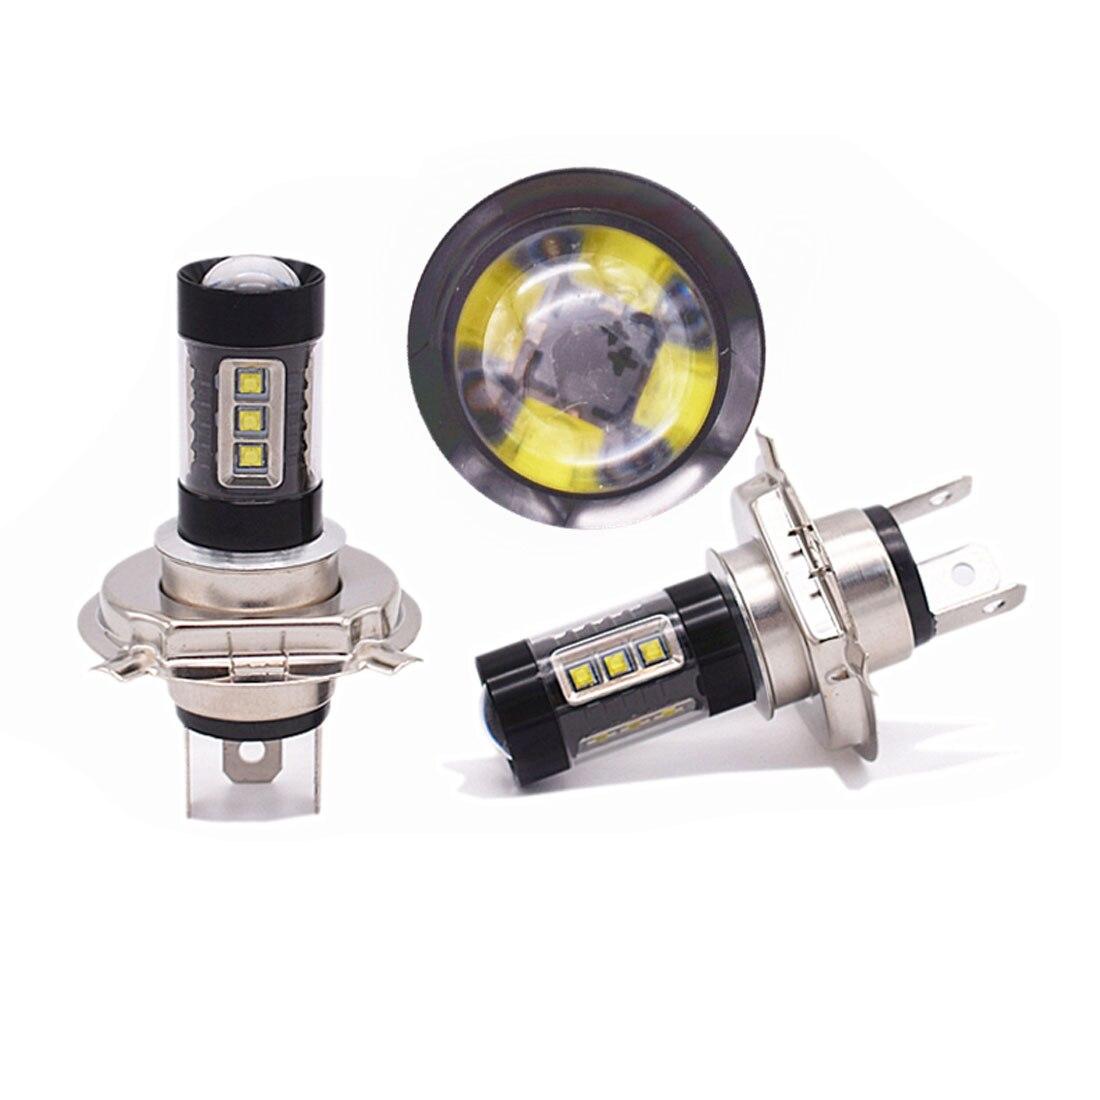 Dongzhen Car H4 LED 9003 HB2 Fog Light Bulb High Low Beam Headlight Automobile Head Lamp